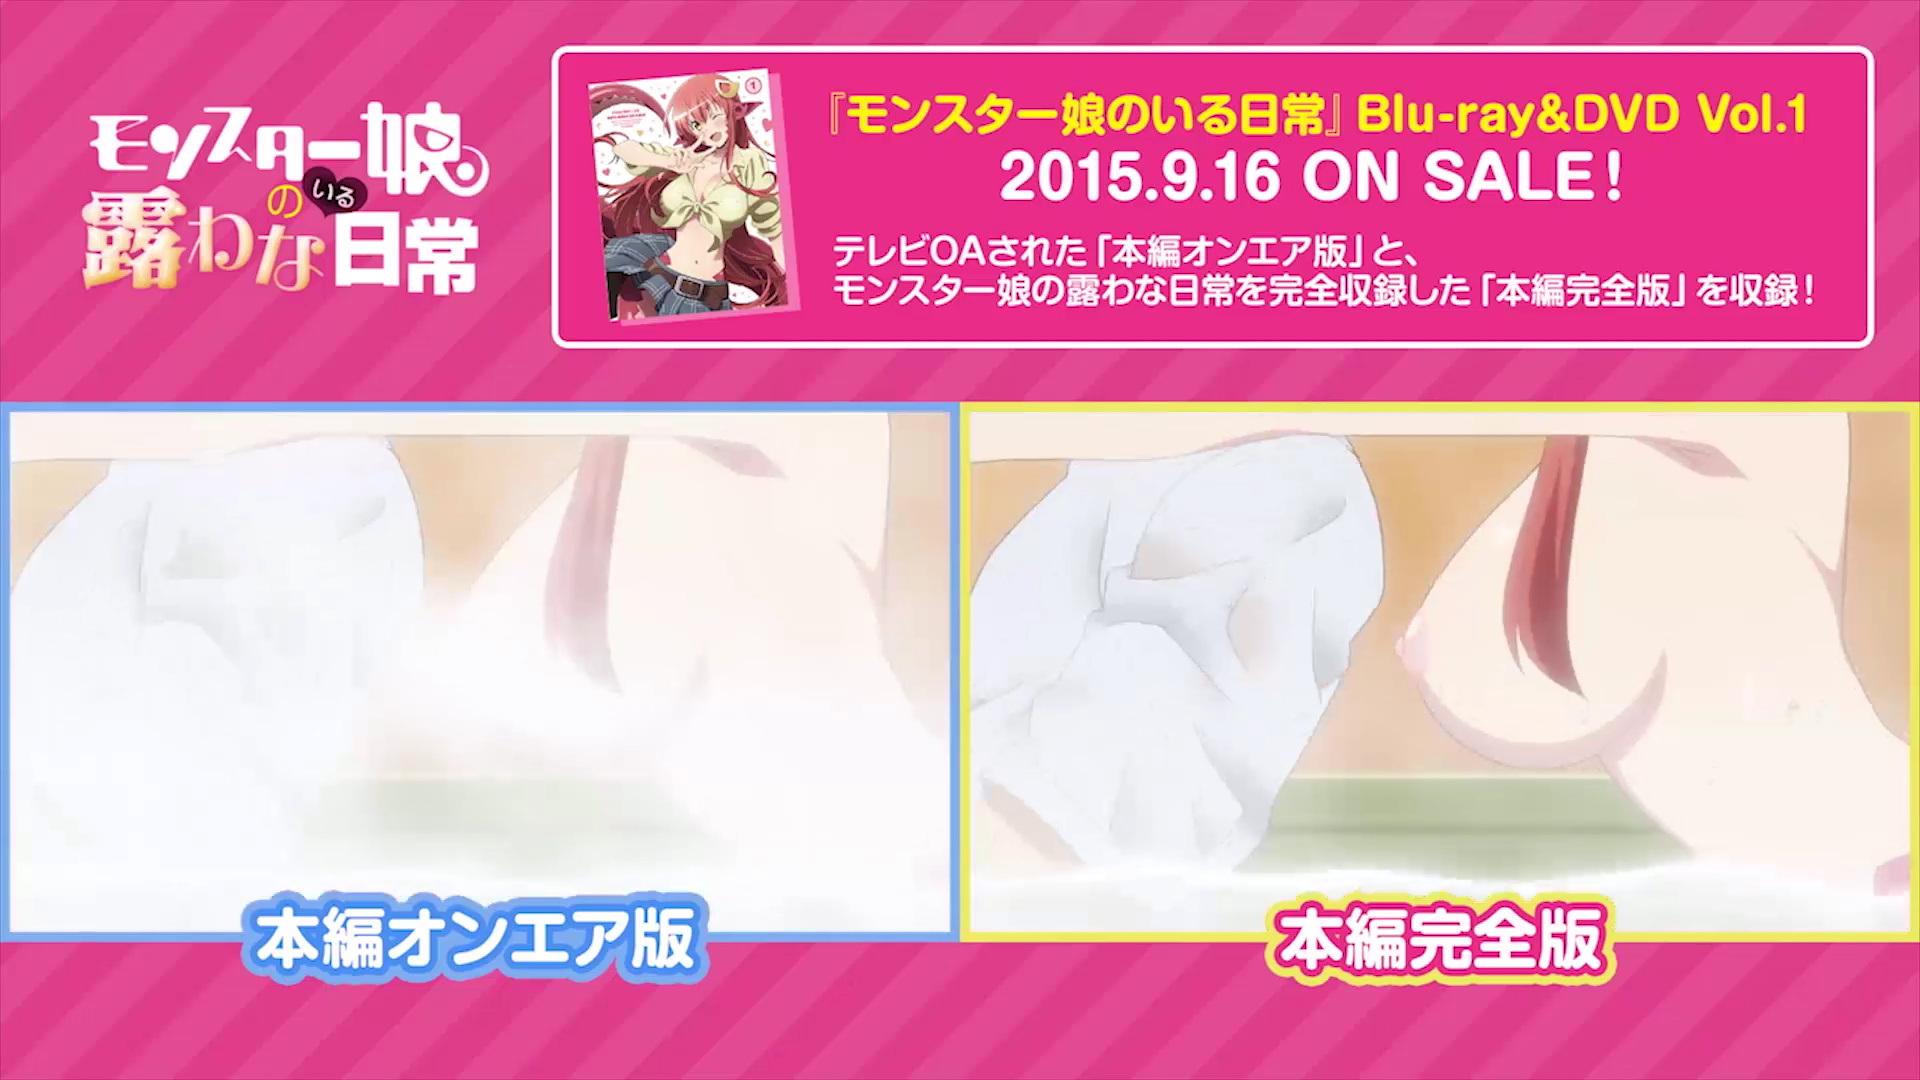 TV vs Blu-Ray Monster Musume anime blu-ray volume 1 uncensored 2